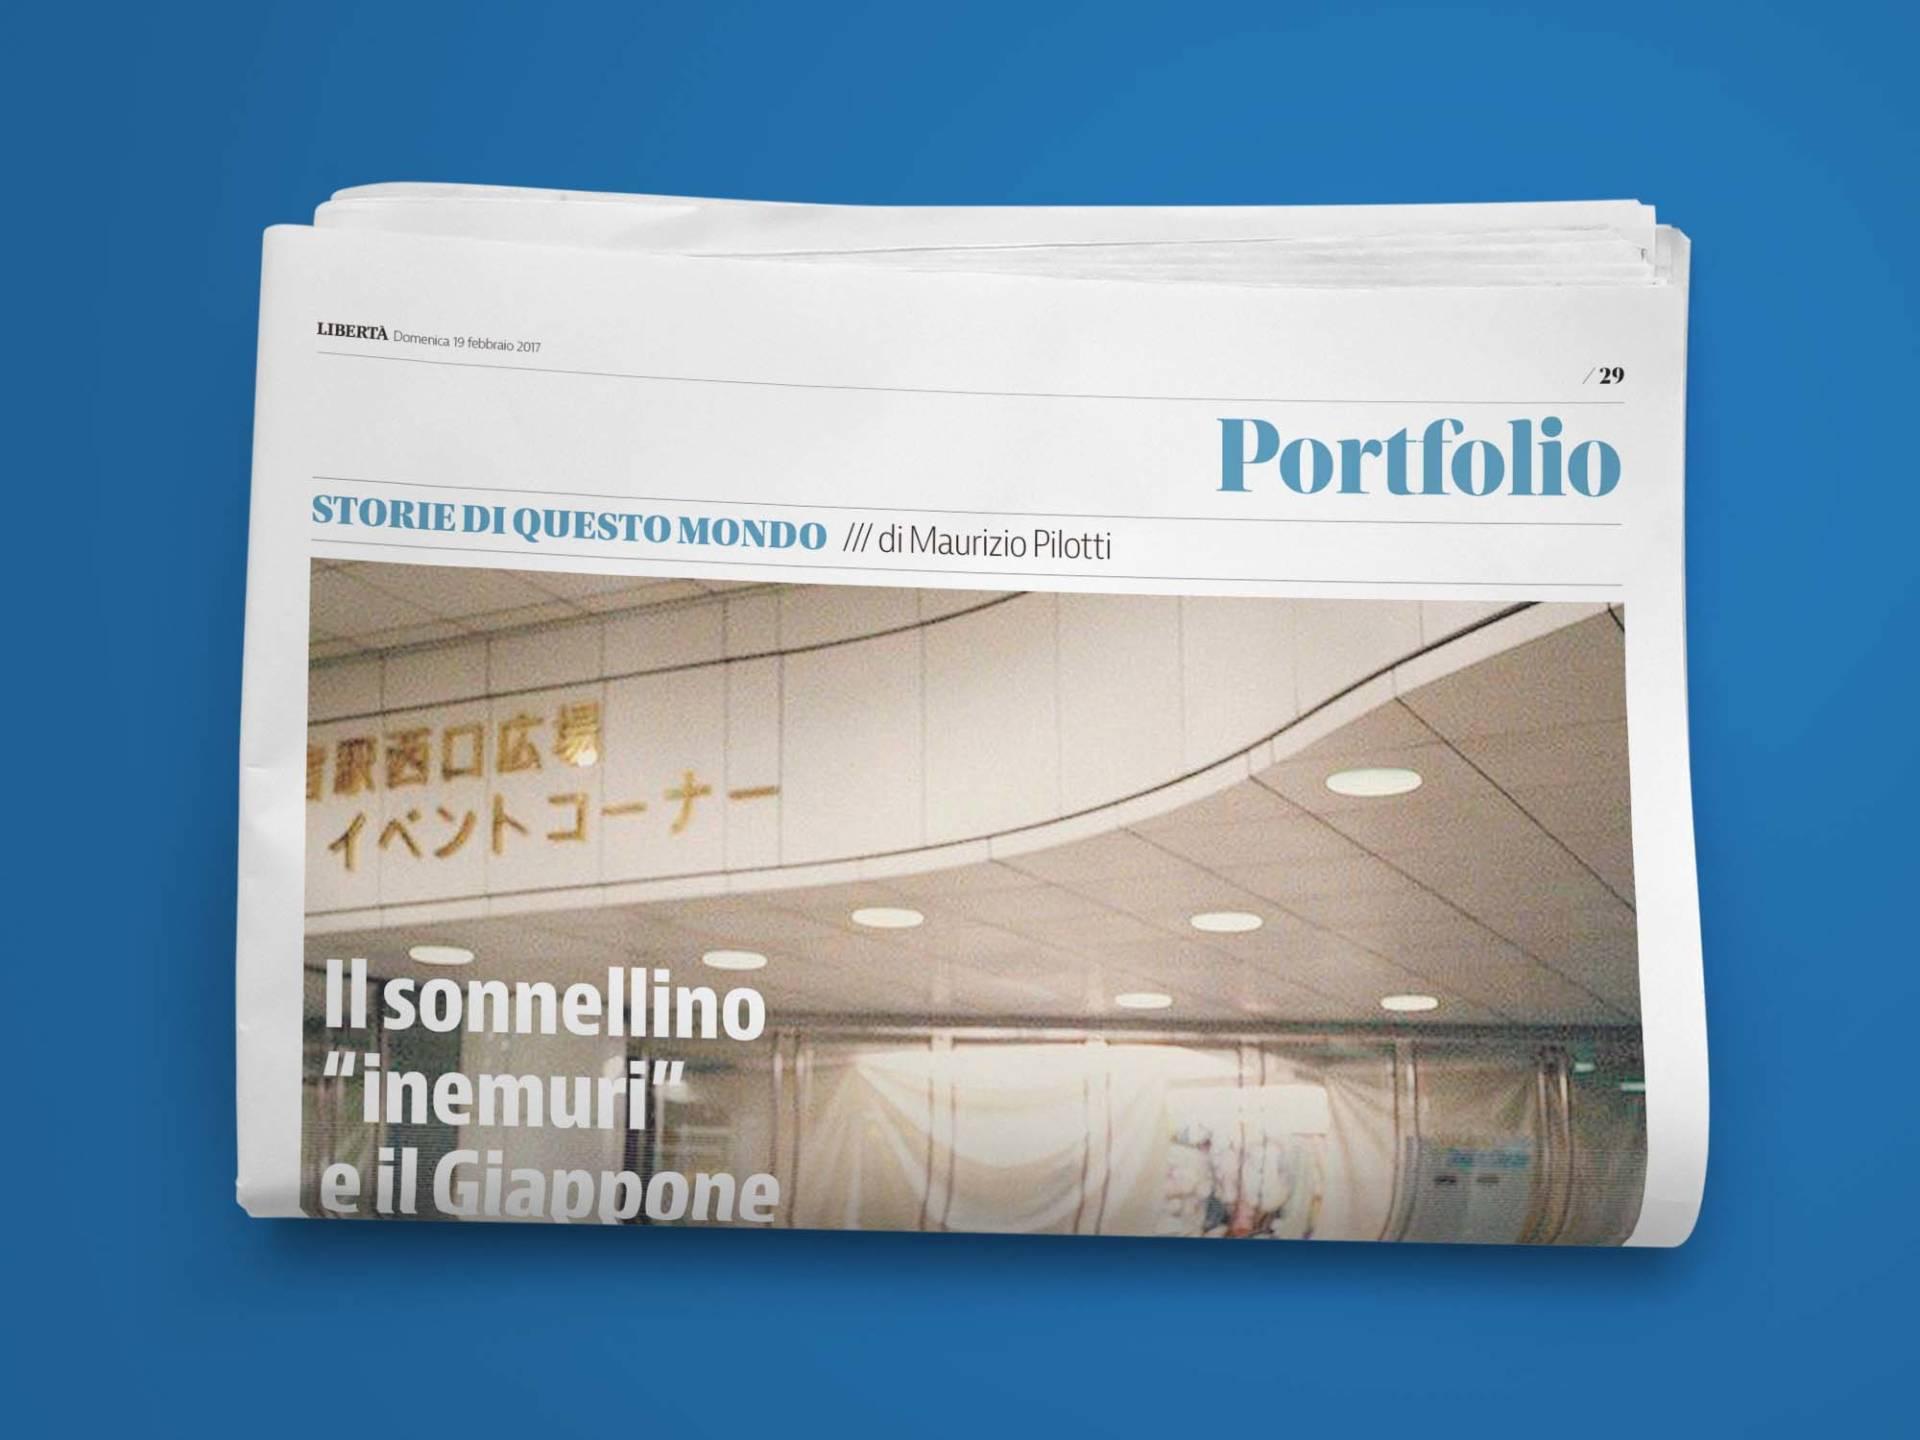 Portfolio_01_Wenceslau_News_Design